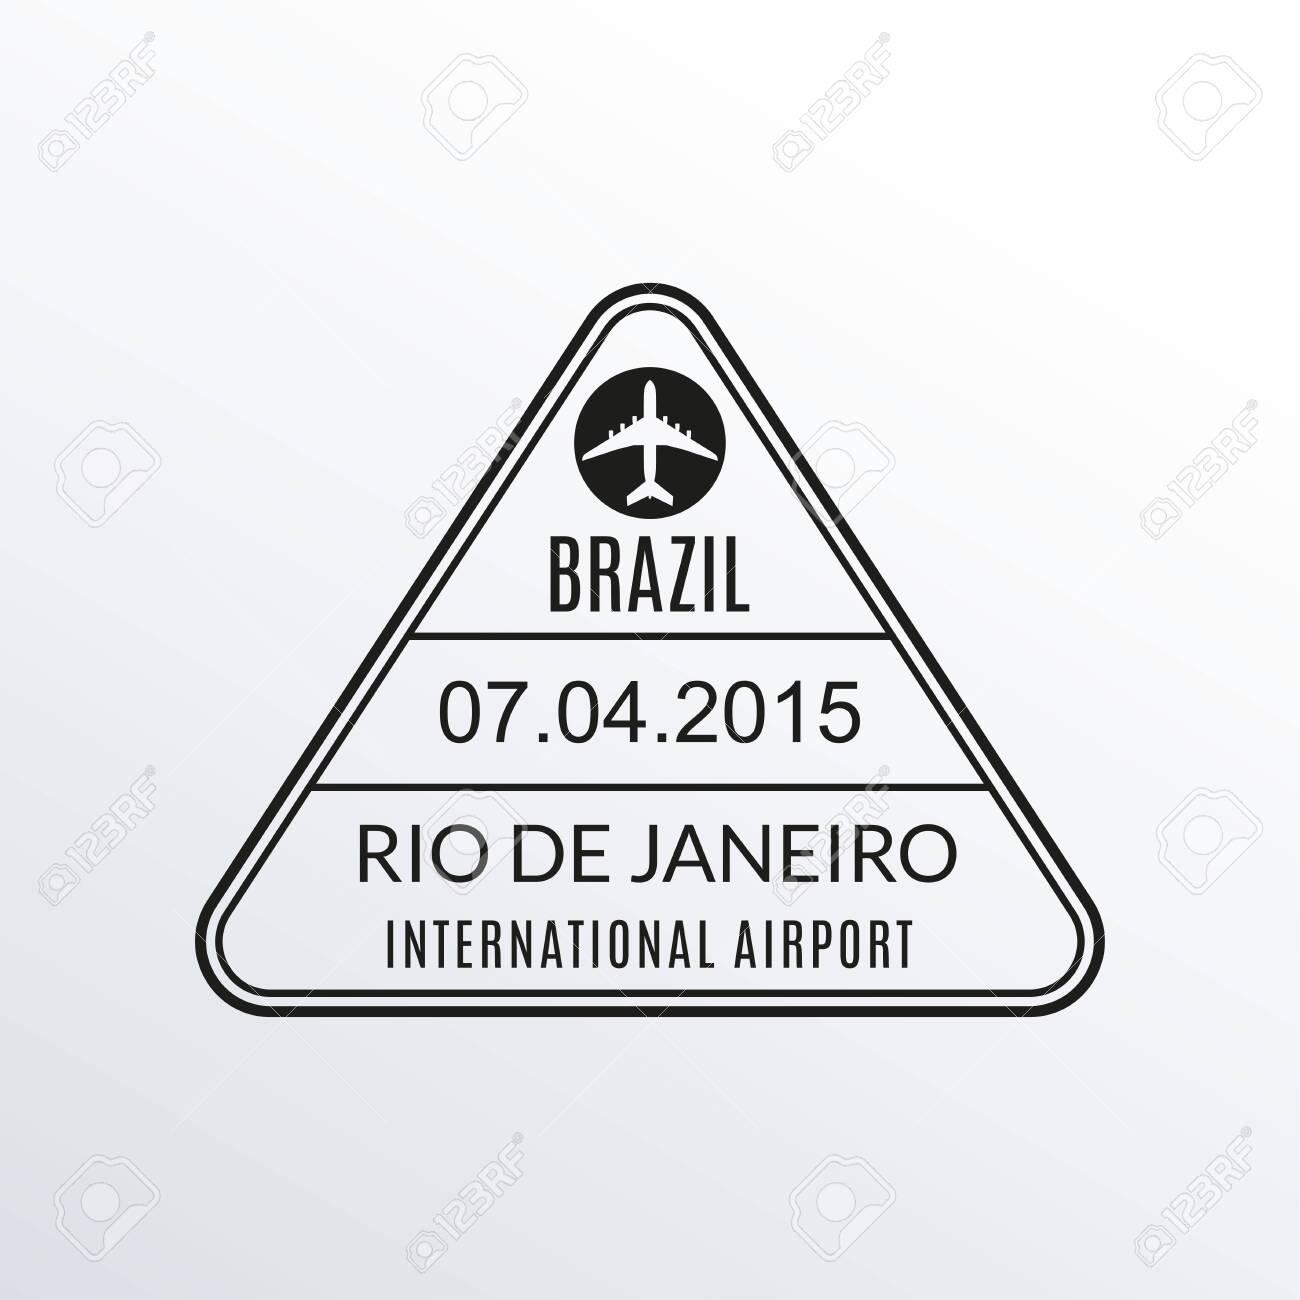 Rio de Janeiro passport stamp. Brazil airport visa stamp or immigration sign. Custom control cachet. Vector illustration. - 139017249